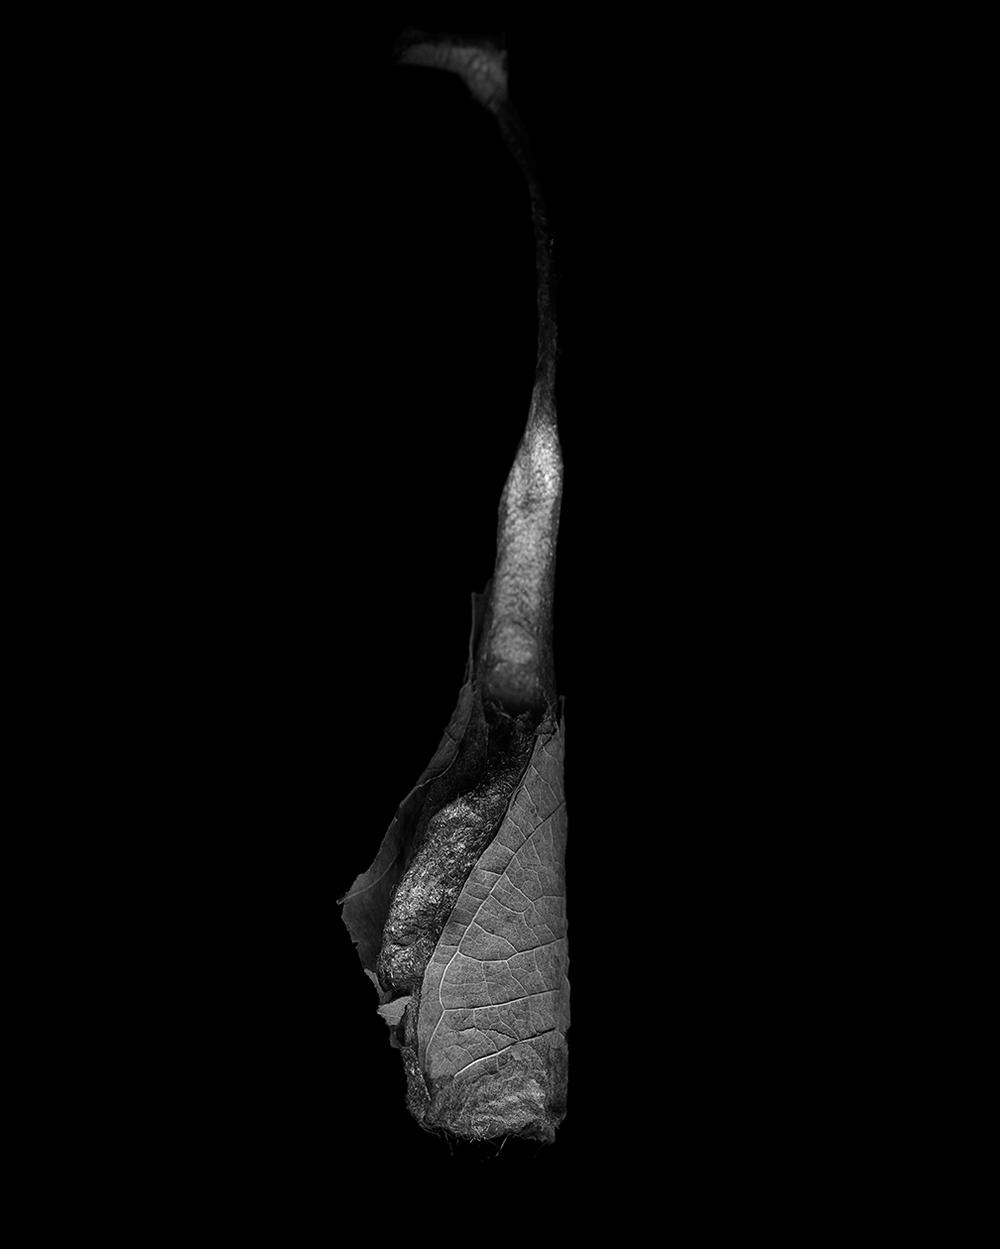 Callosamia Promethea Cocoon II (2014)